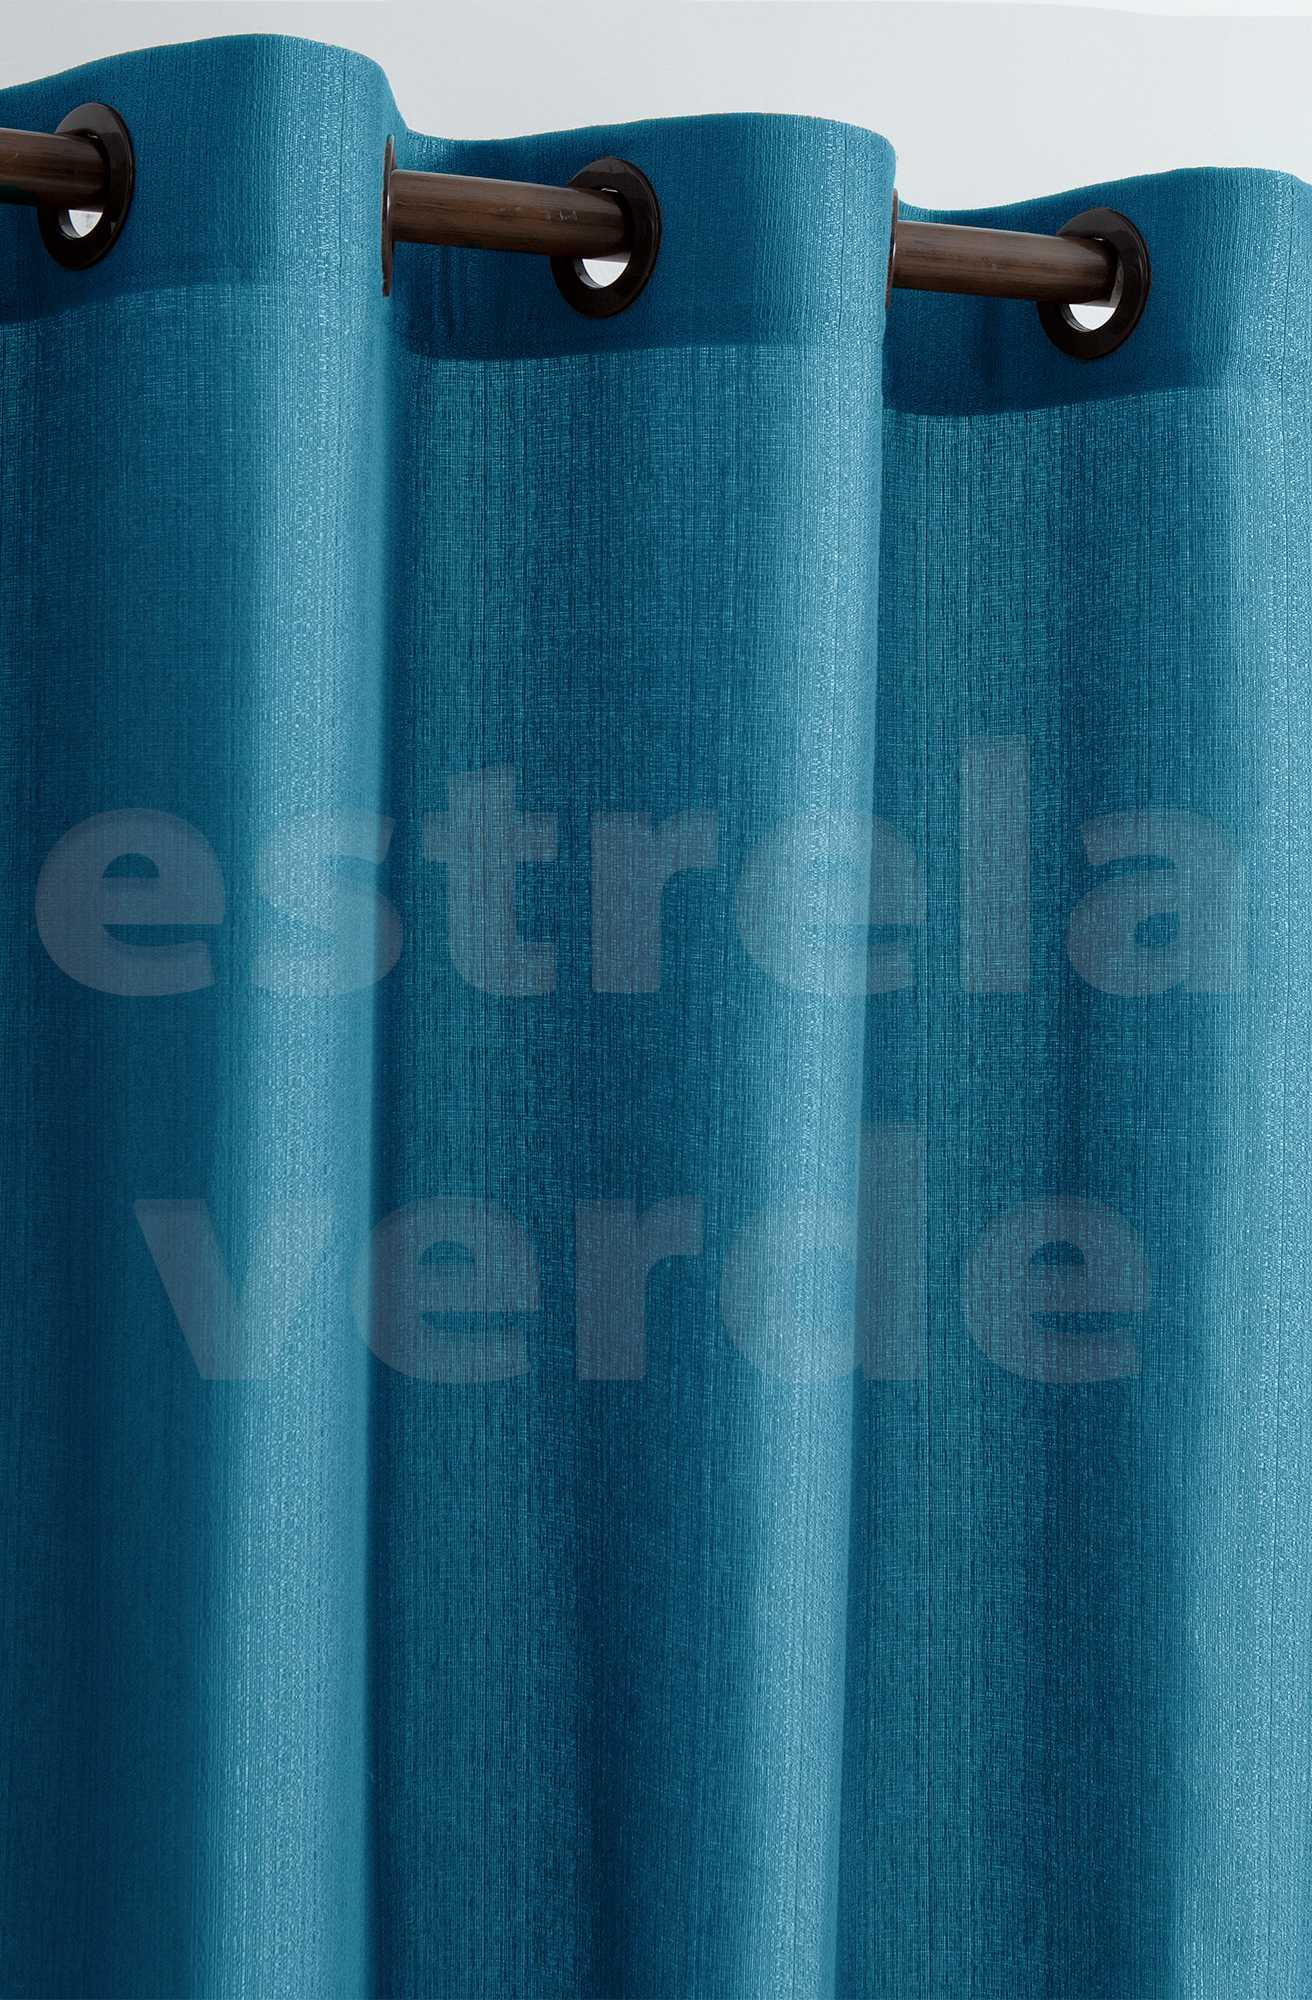 CORTINA VENEZA 2,60X2,30 4106 ARDOSIA  - Estrela Verde